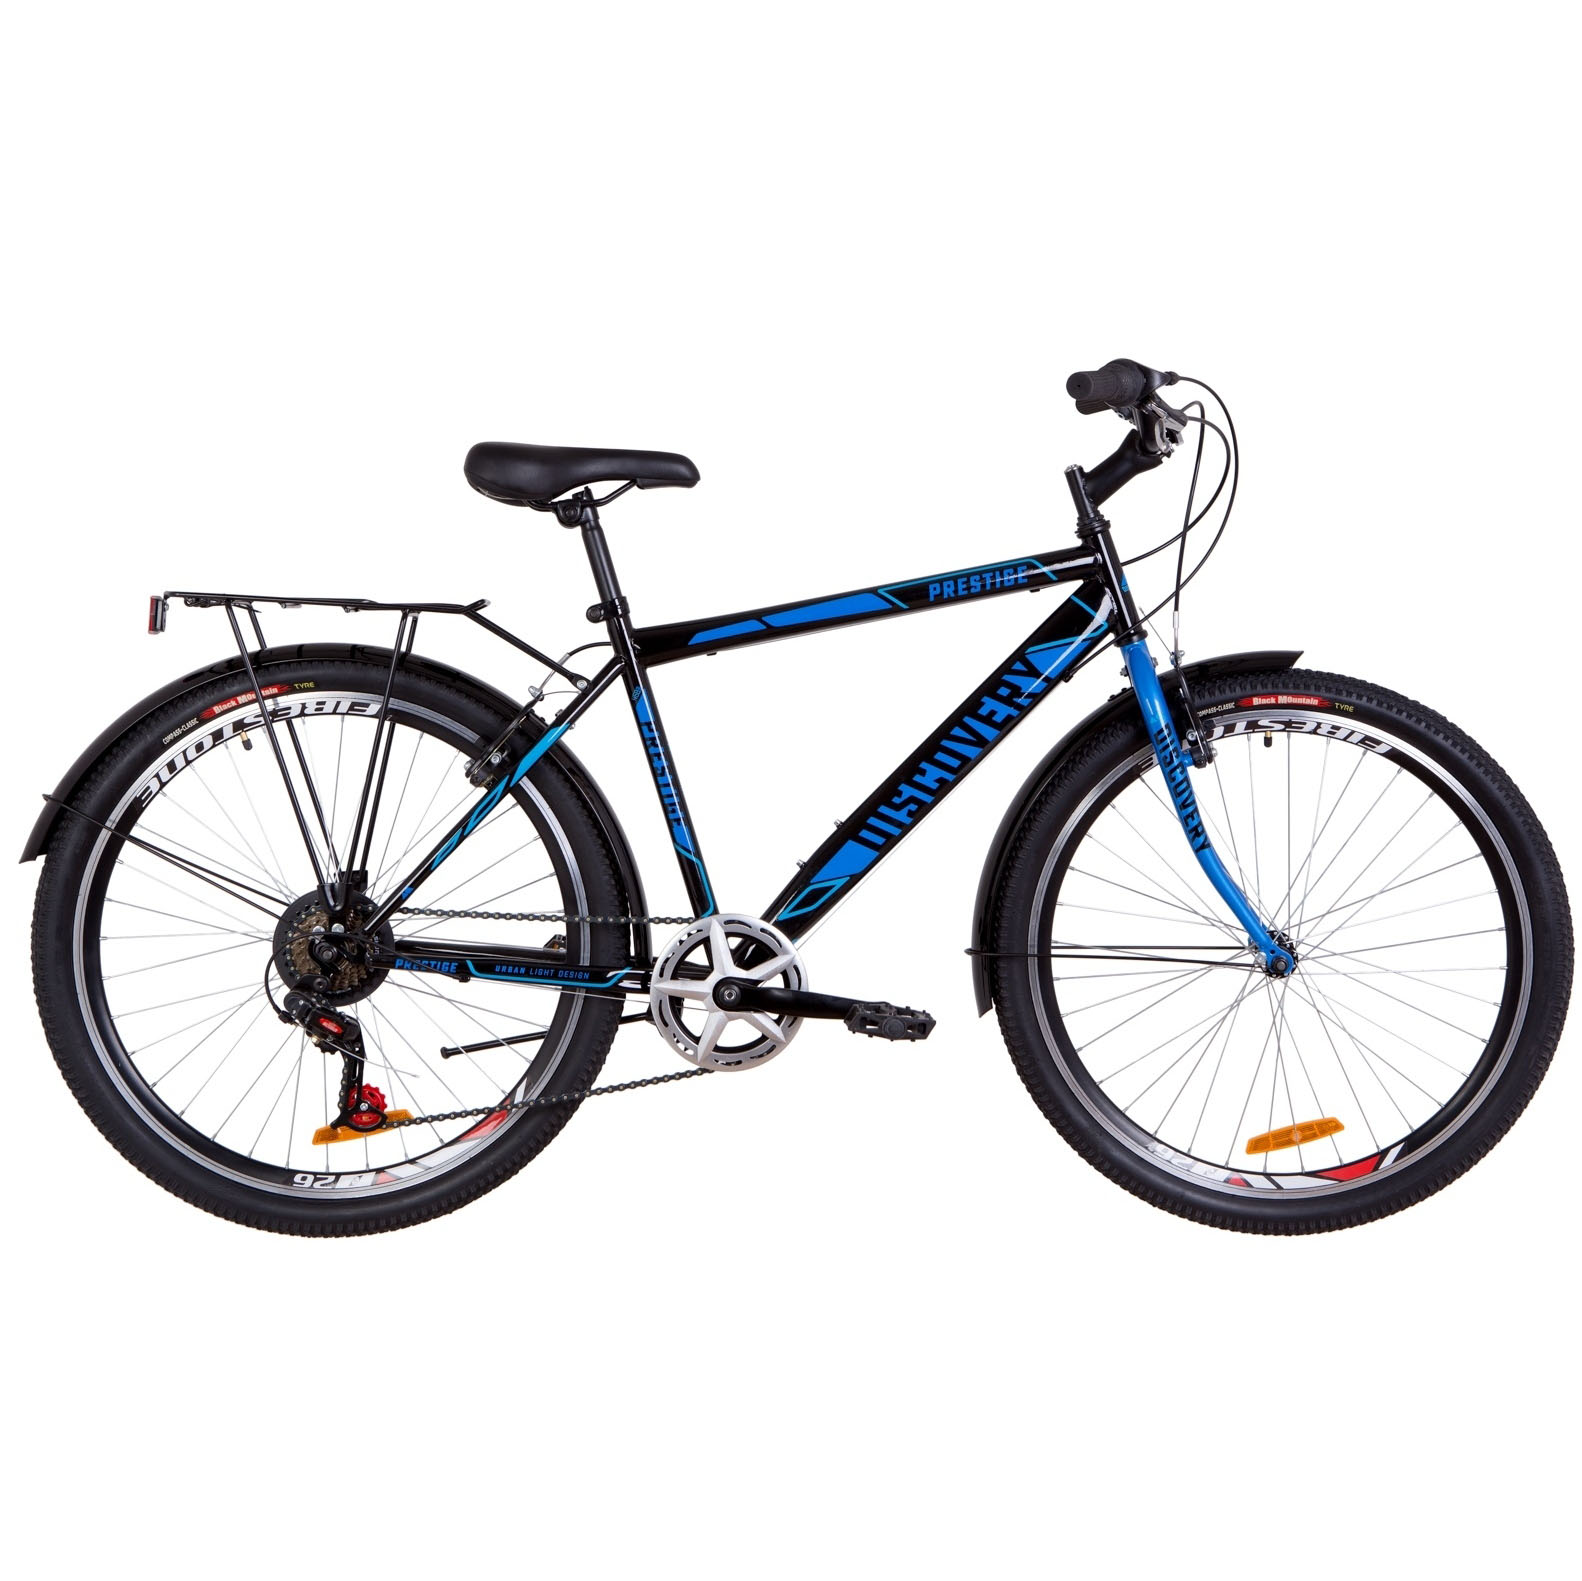 Фото Городской Велосипед 26 Discovery PRESTIGE MAN черно-синий 2019